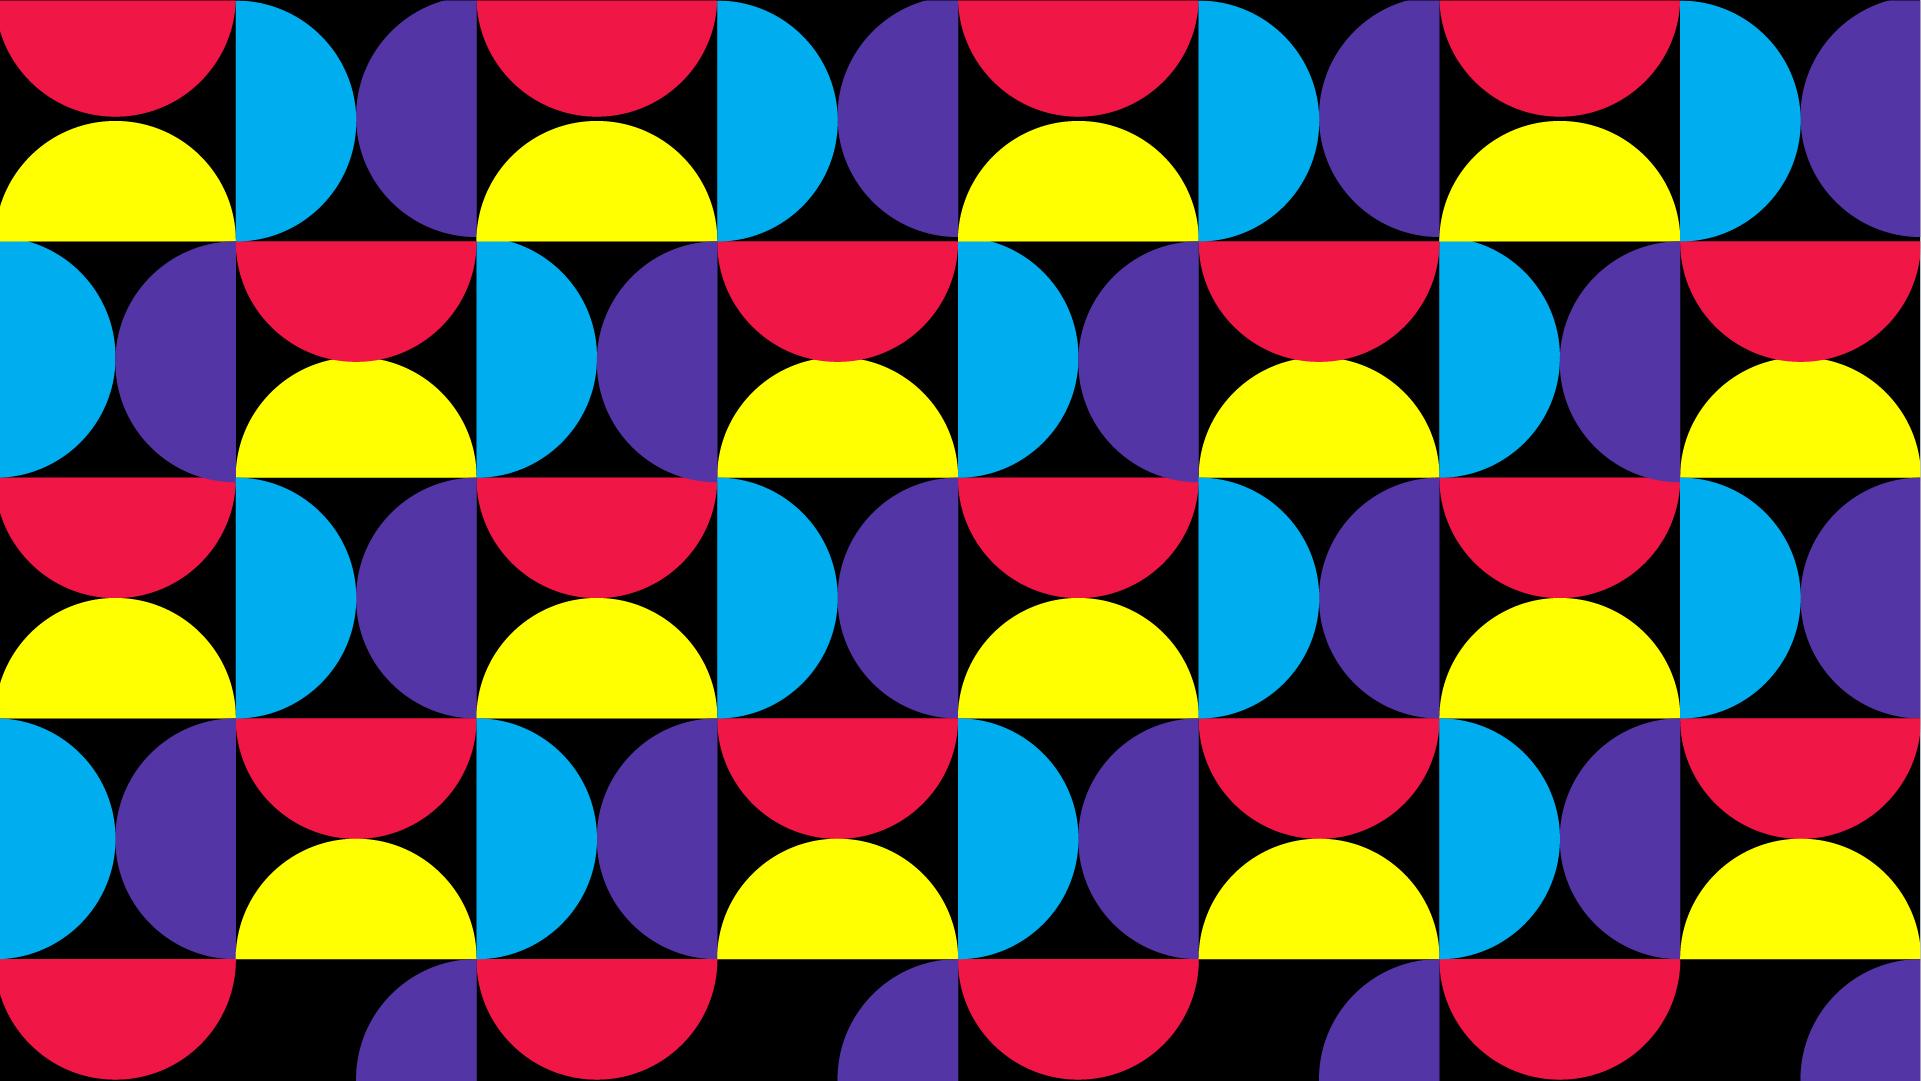 WH17_Pattern_029.jpg